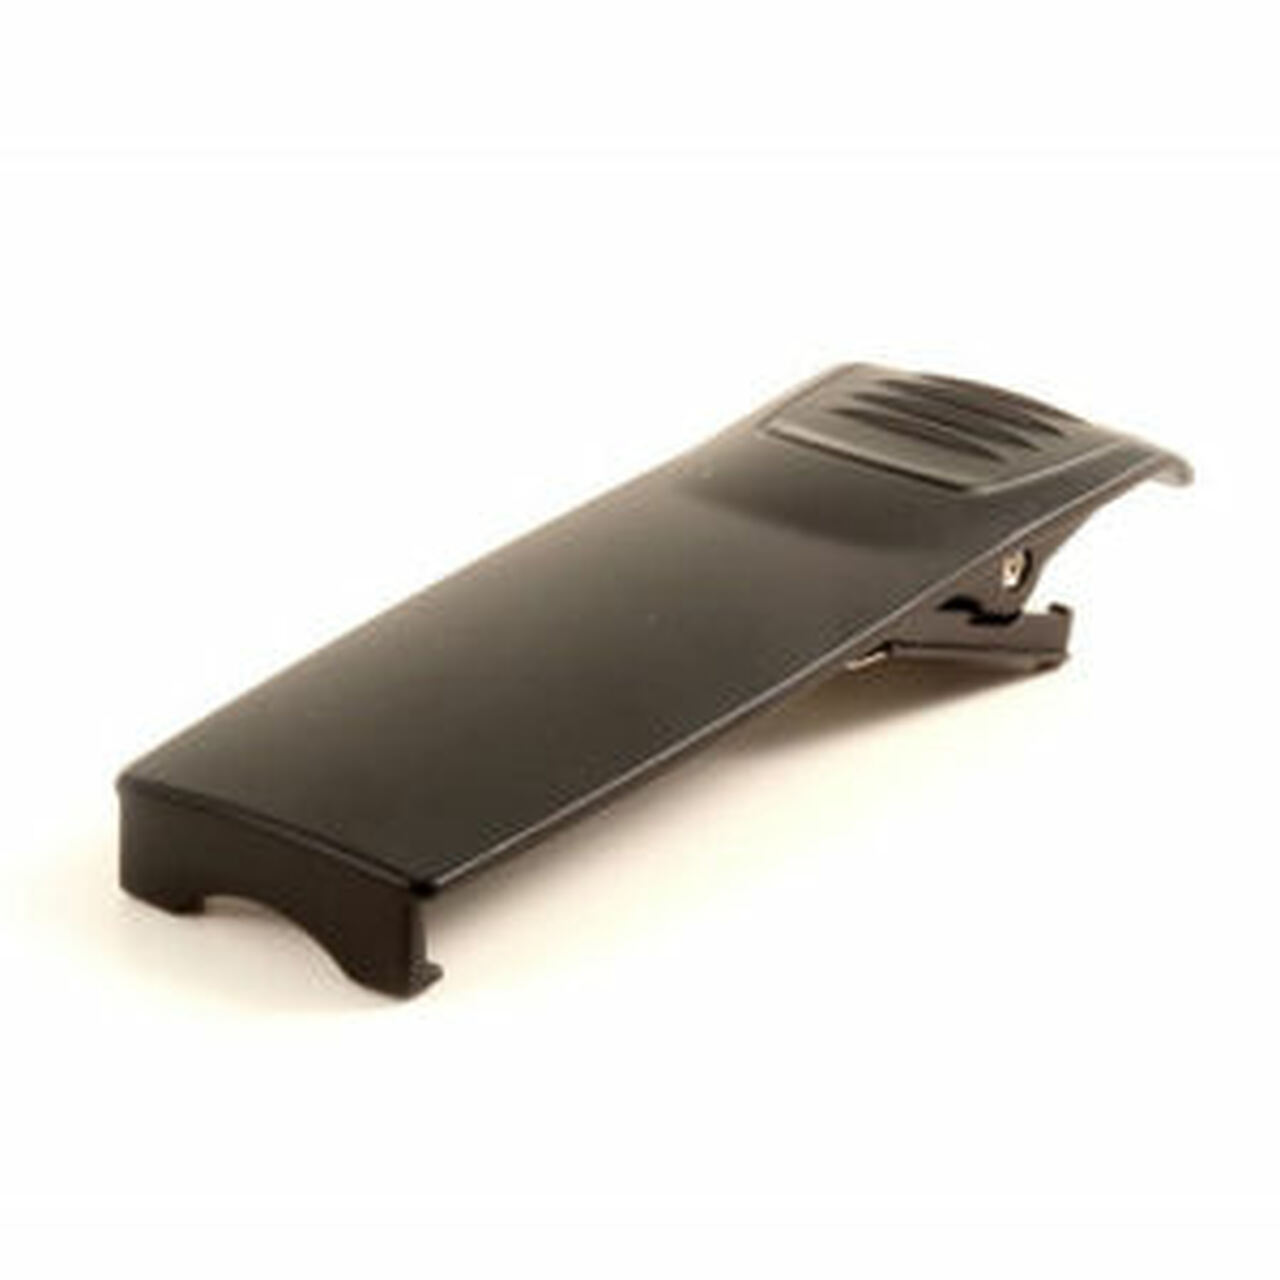 M/A-Com P7230 Metal, Spring Loaded Belt Clip